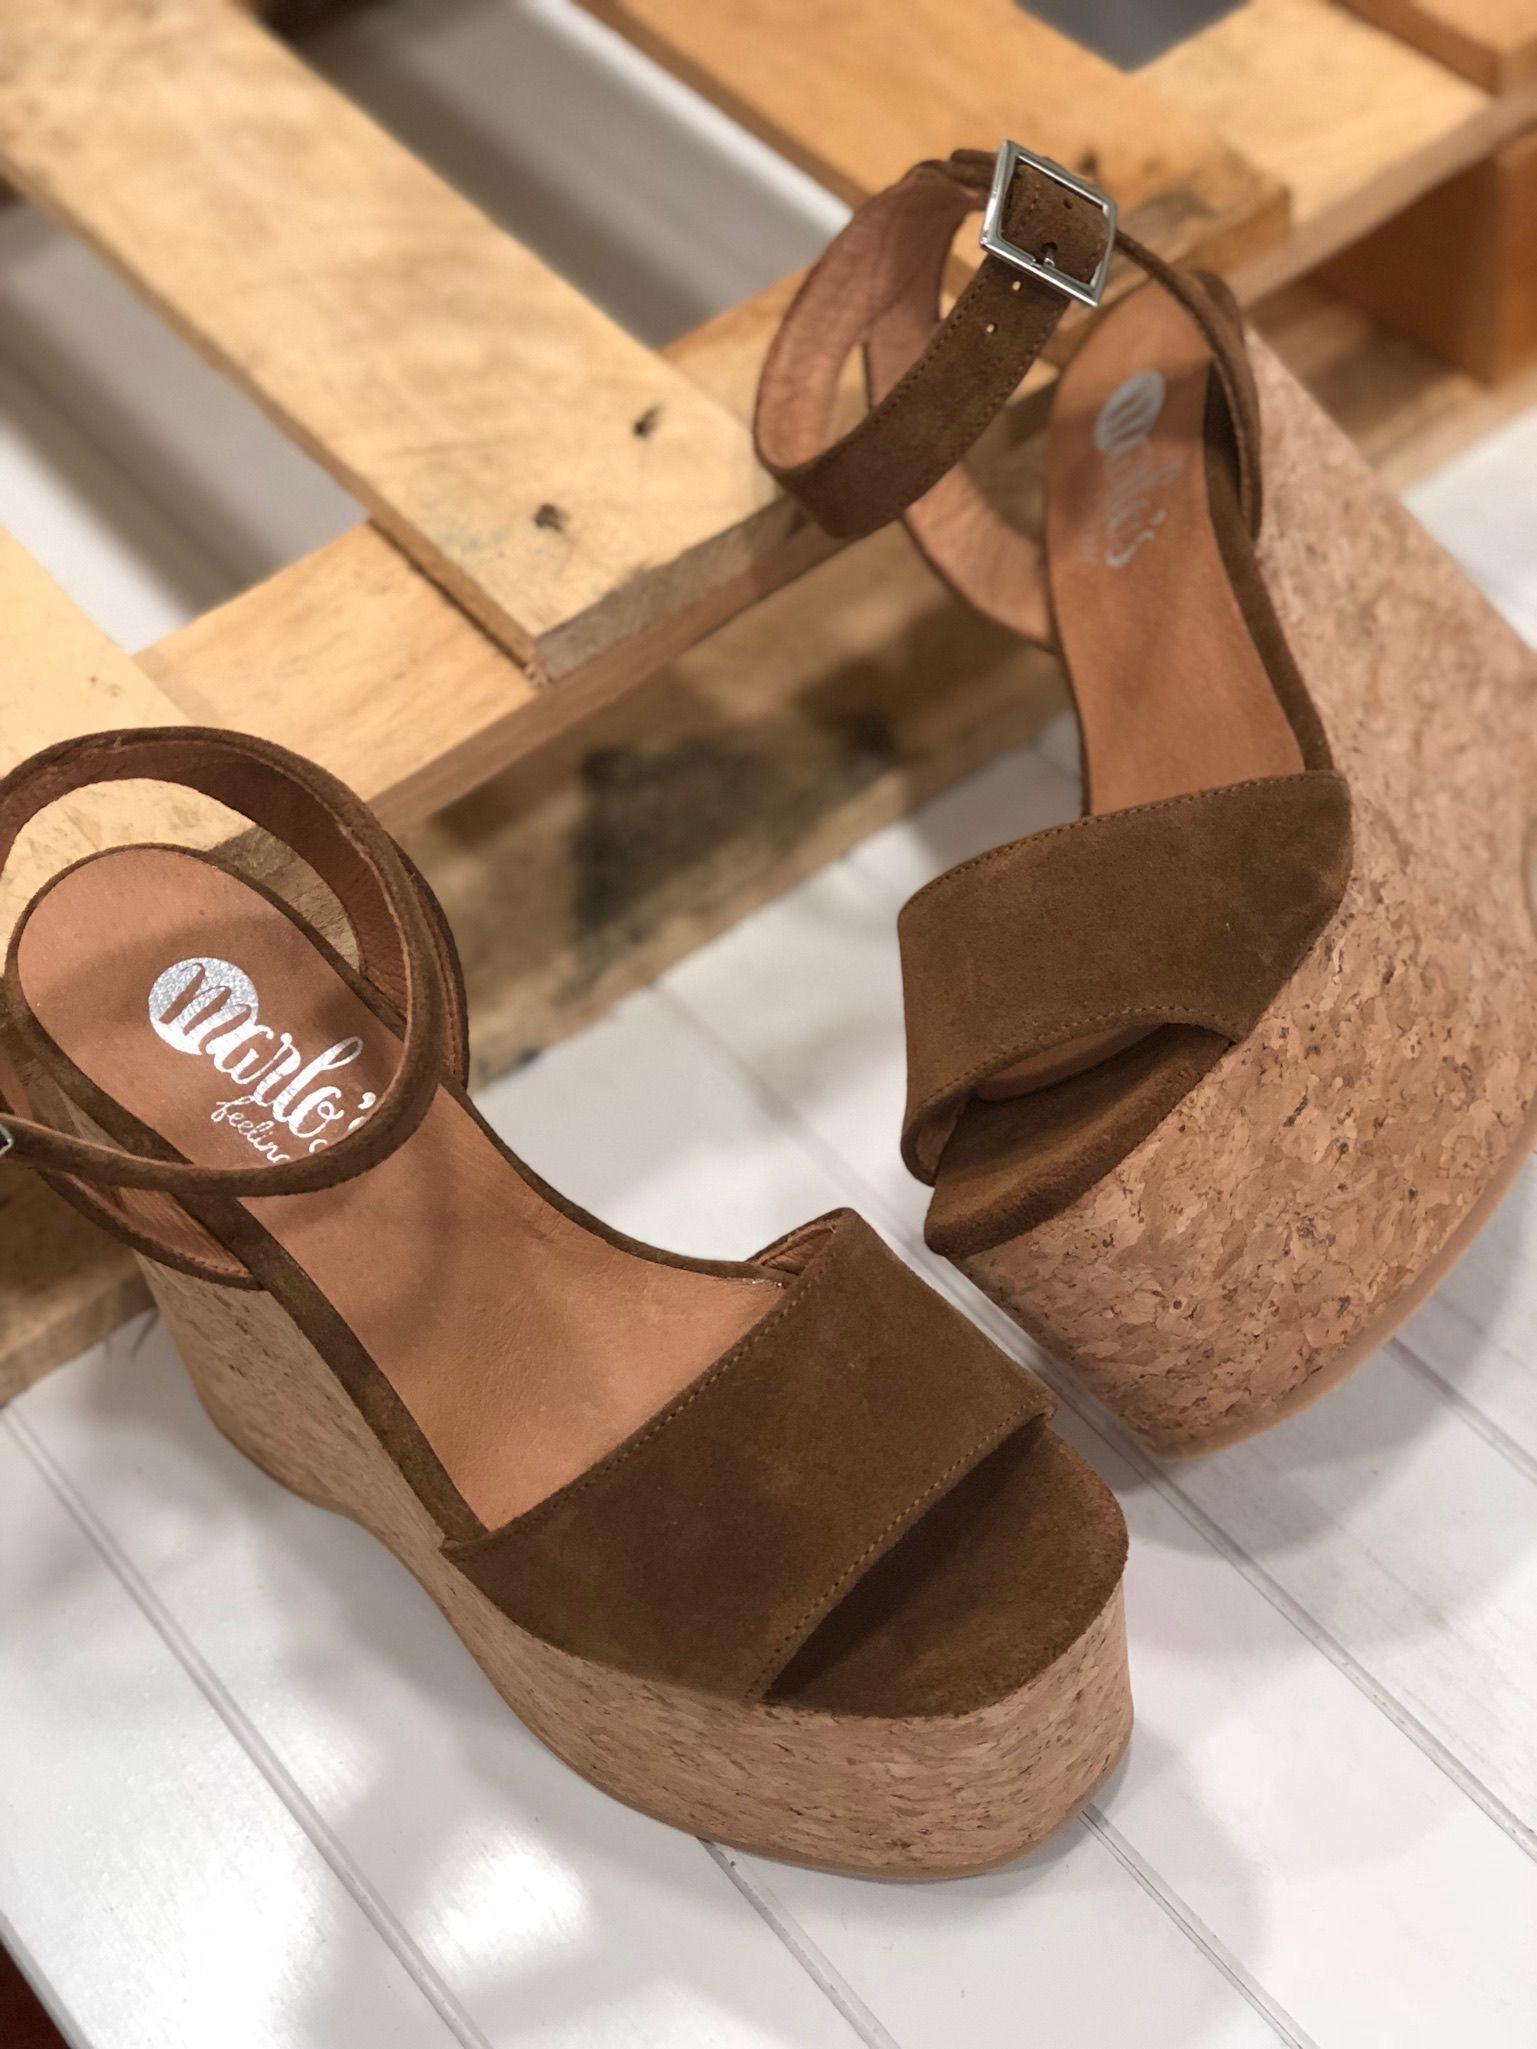 Marlos Feelings MaiteZapatos Y Sandalias Cork ShoesWedges 5LjAR34